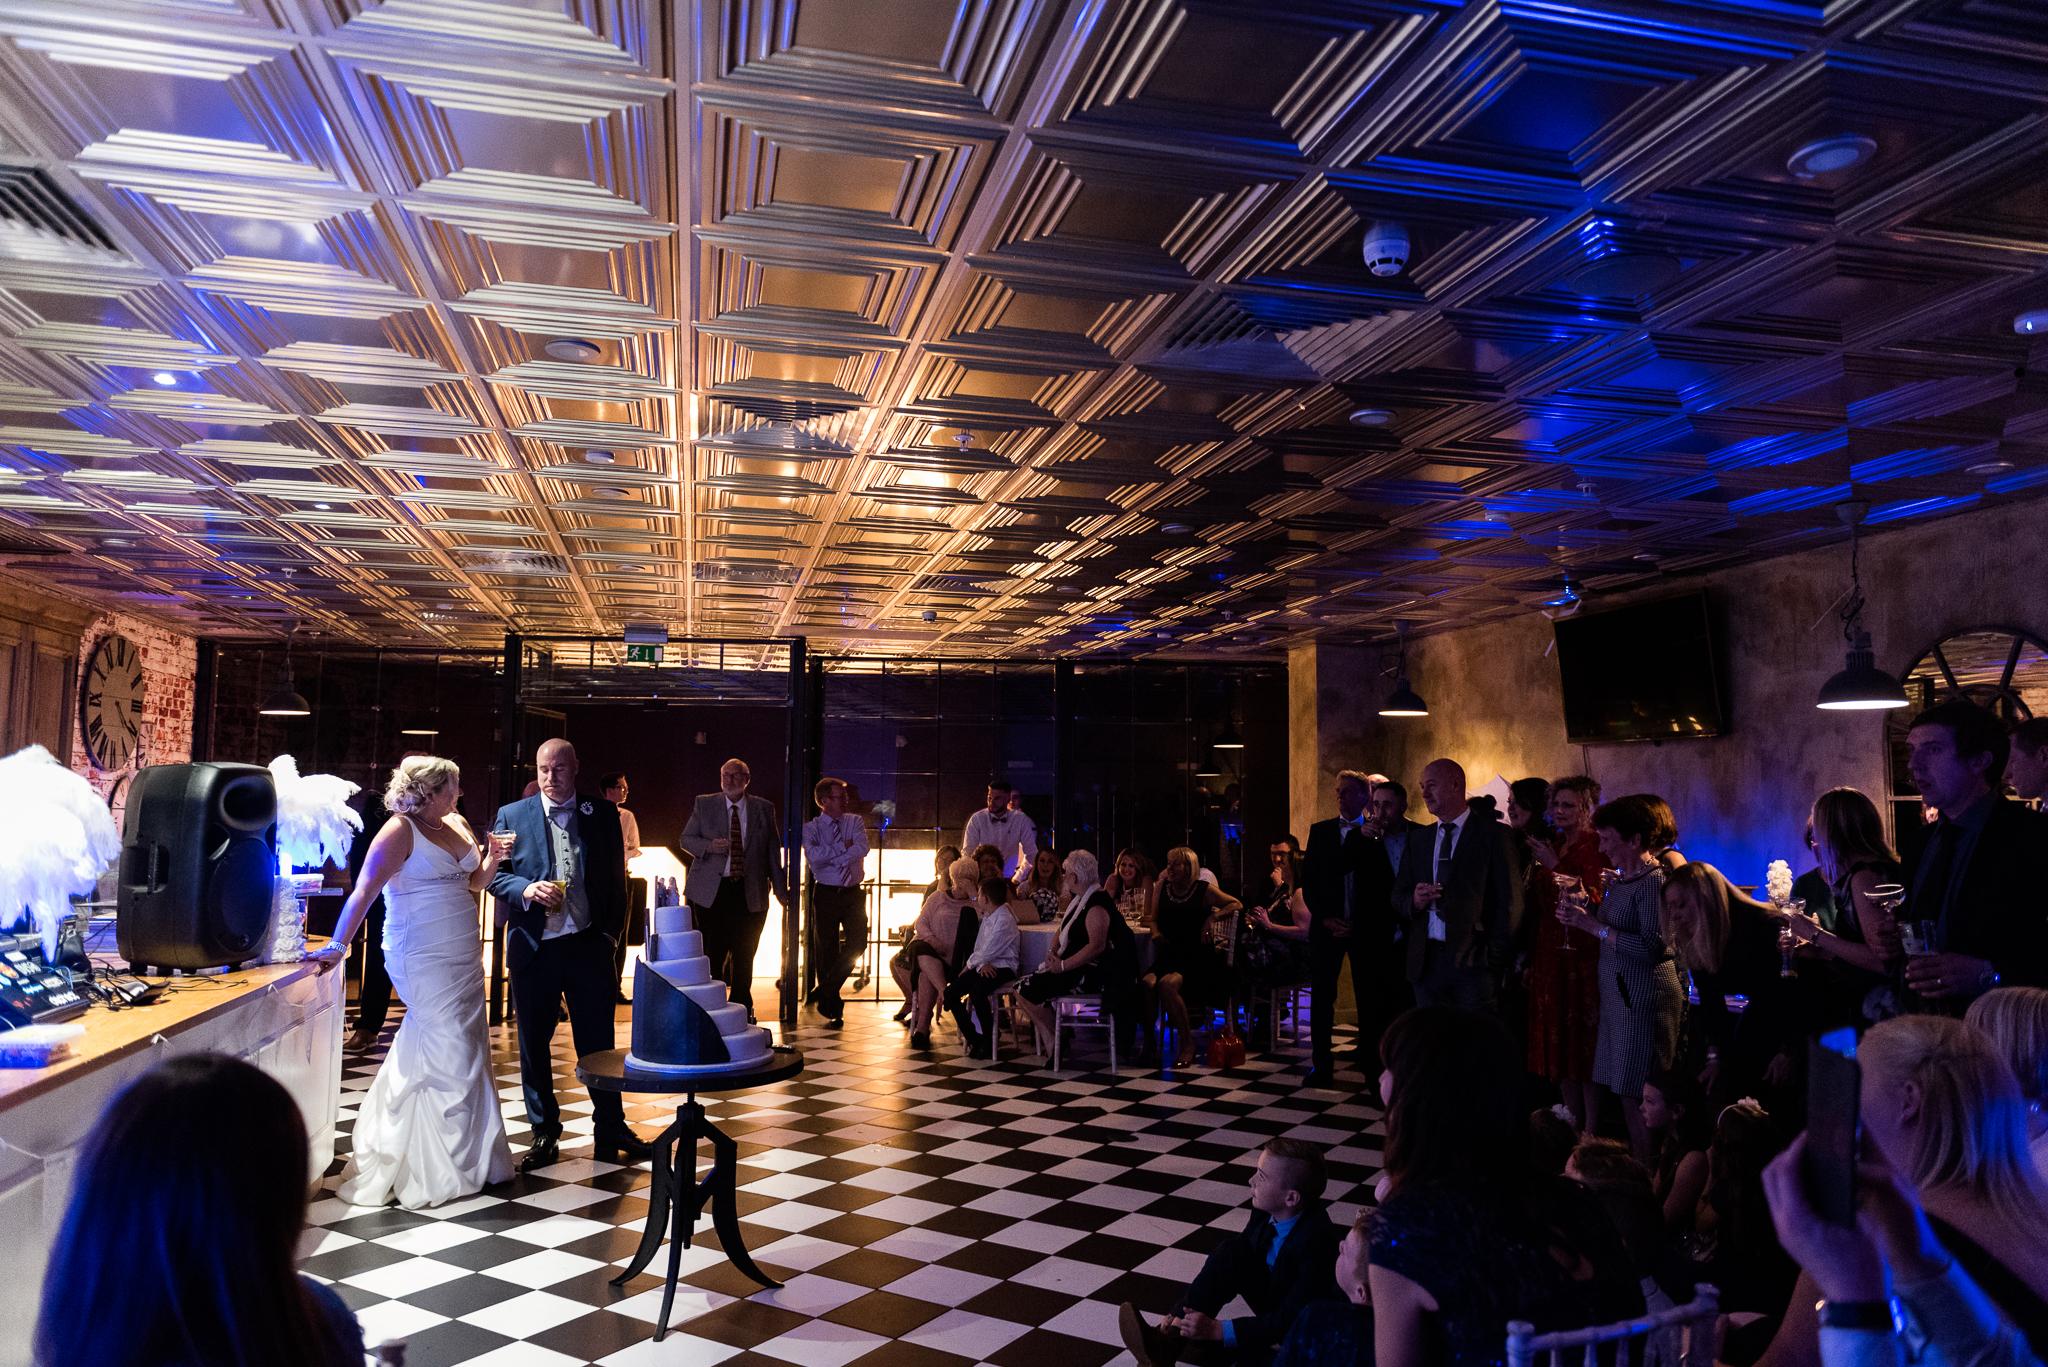 Manchester Wedding Photography On the 7th Media City UK, Salford 20s Art Deco Feathers Urban - Jenny Harper-31.jpg